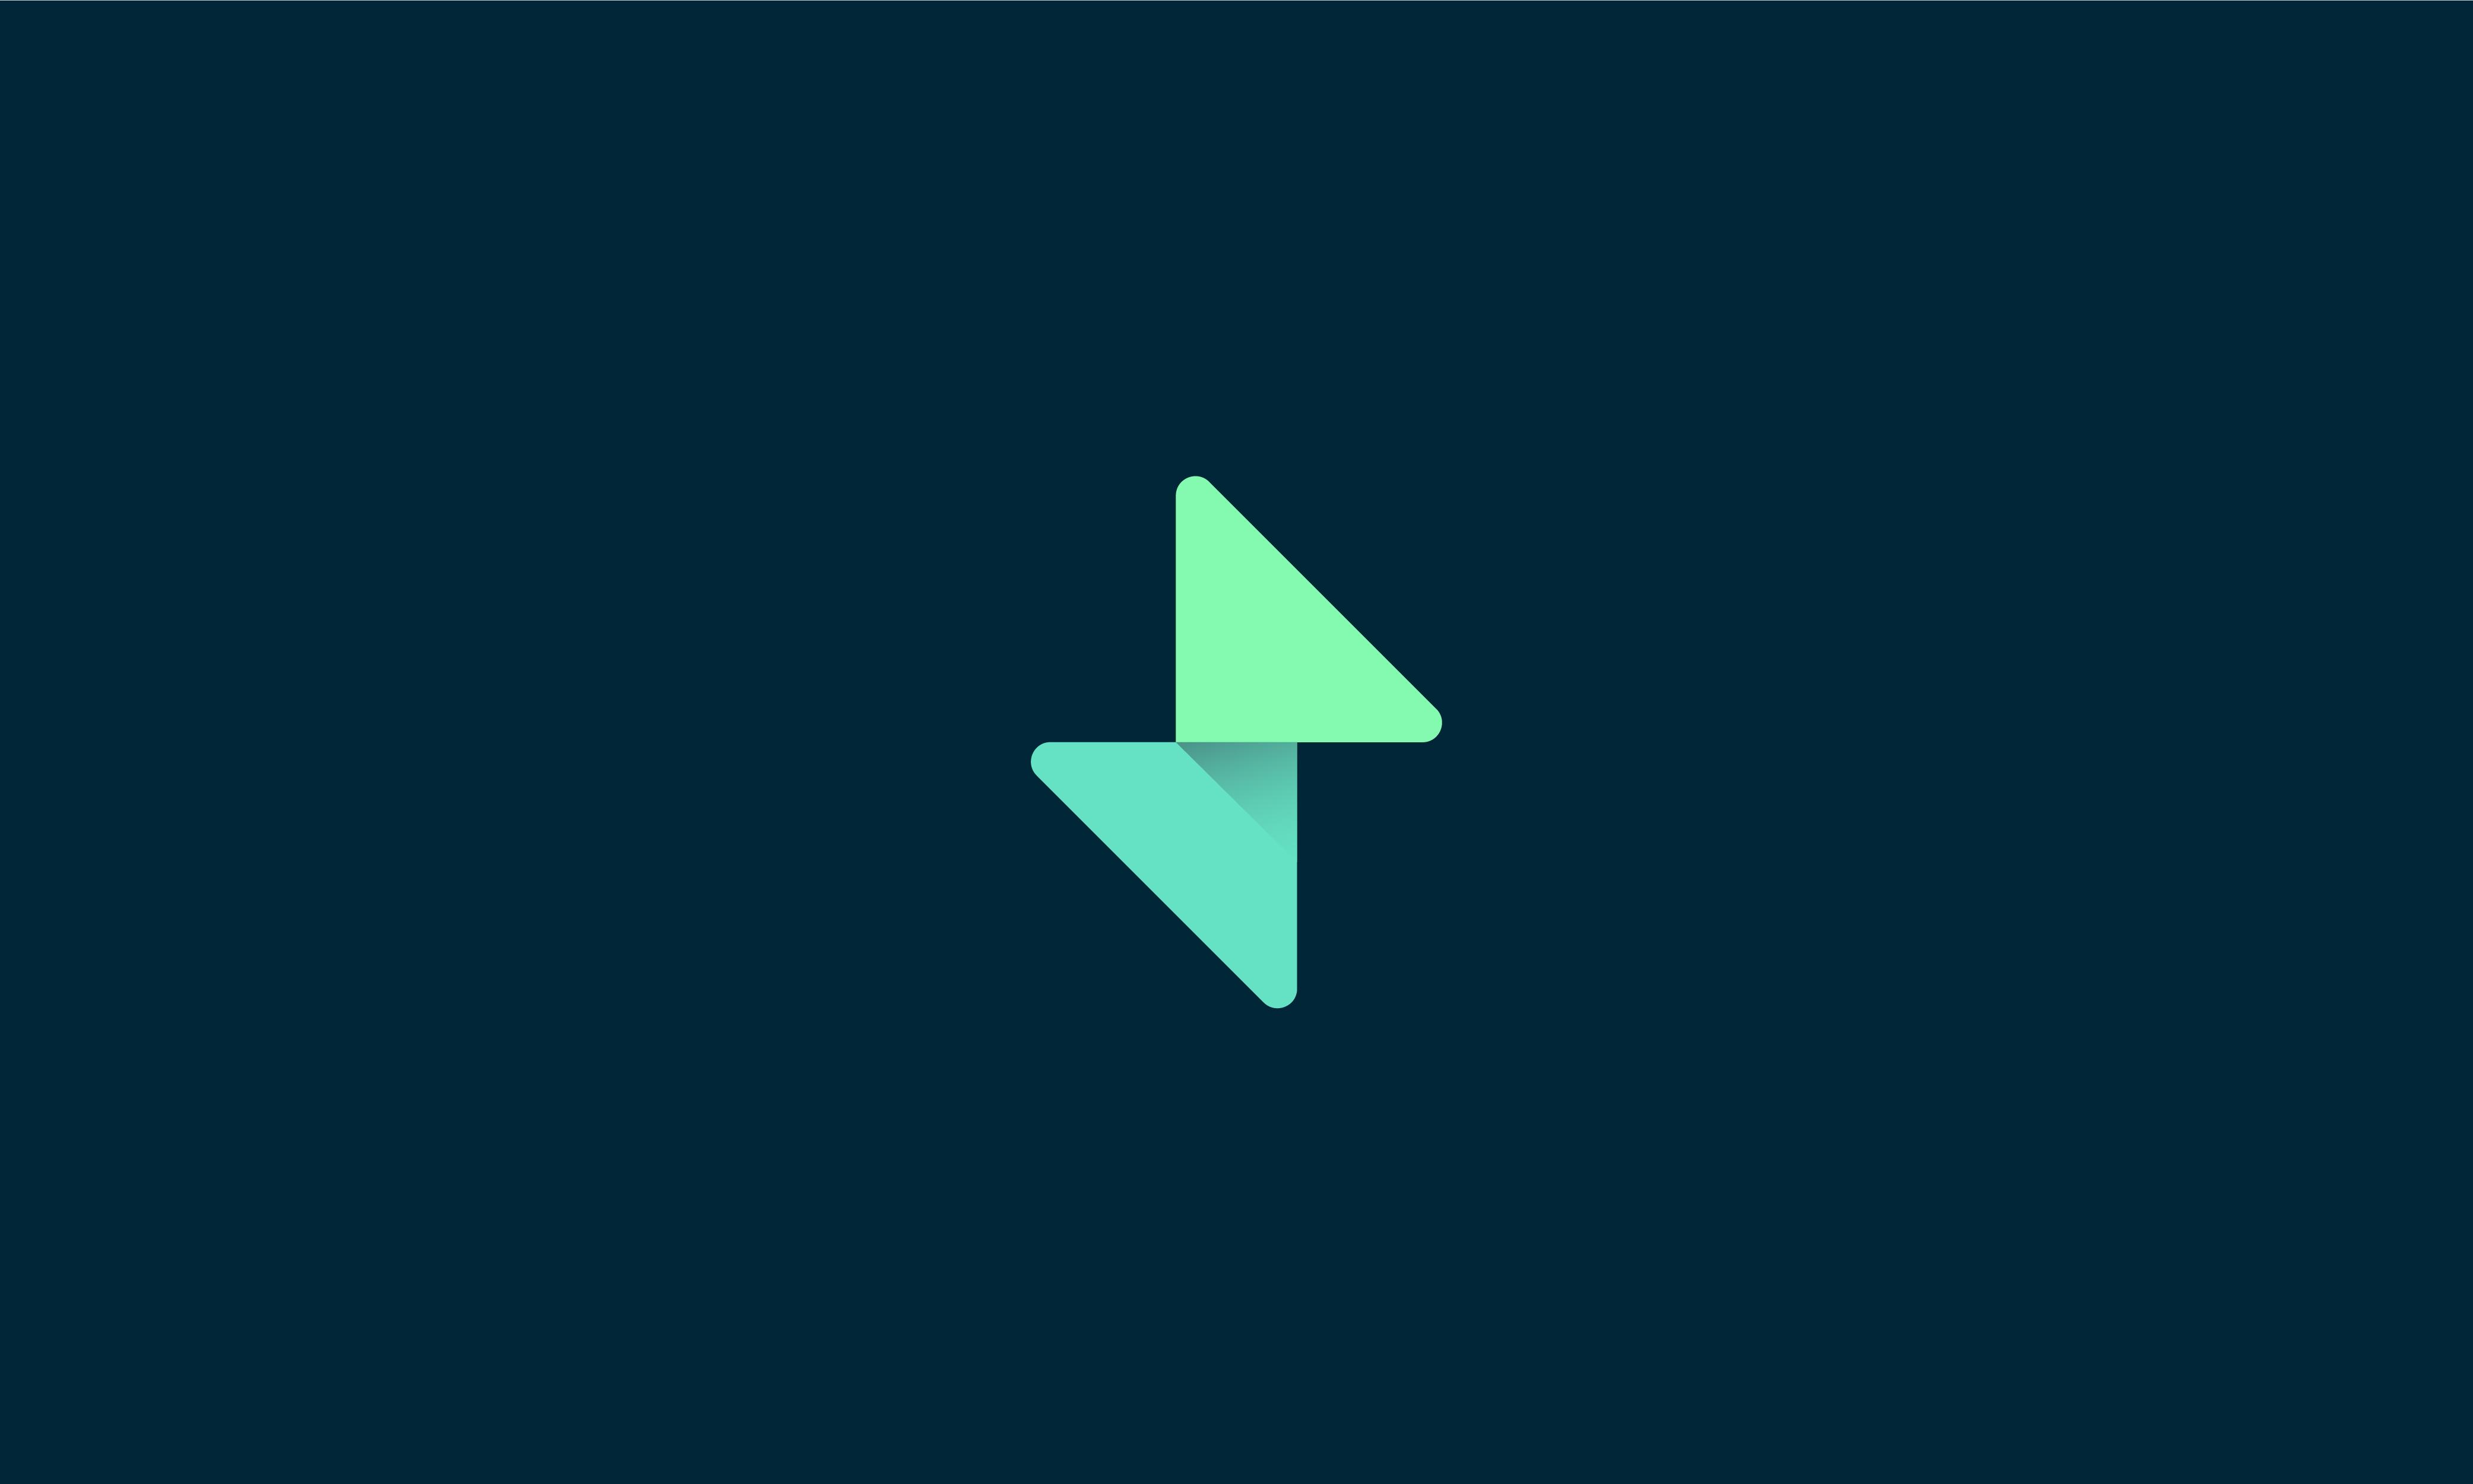 Срочно! Дизайн логотипа ООО «СЭТ» фото f_7315d4eb53ca603b.jpg